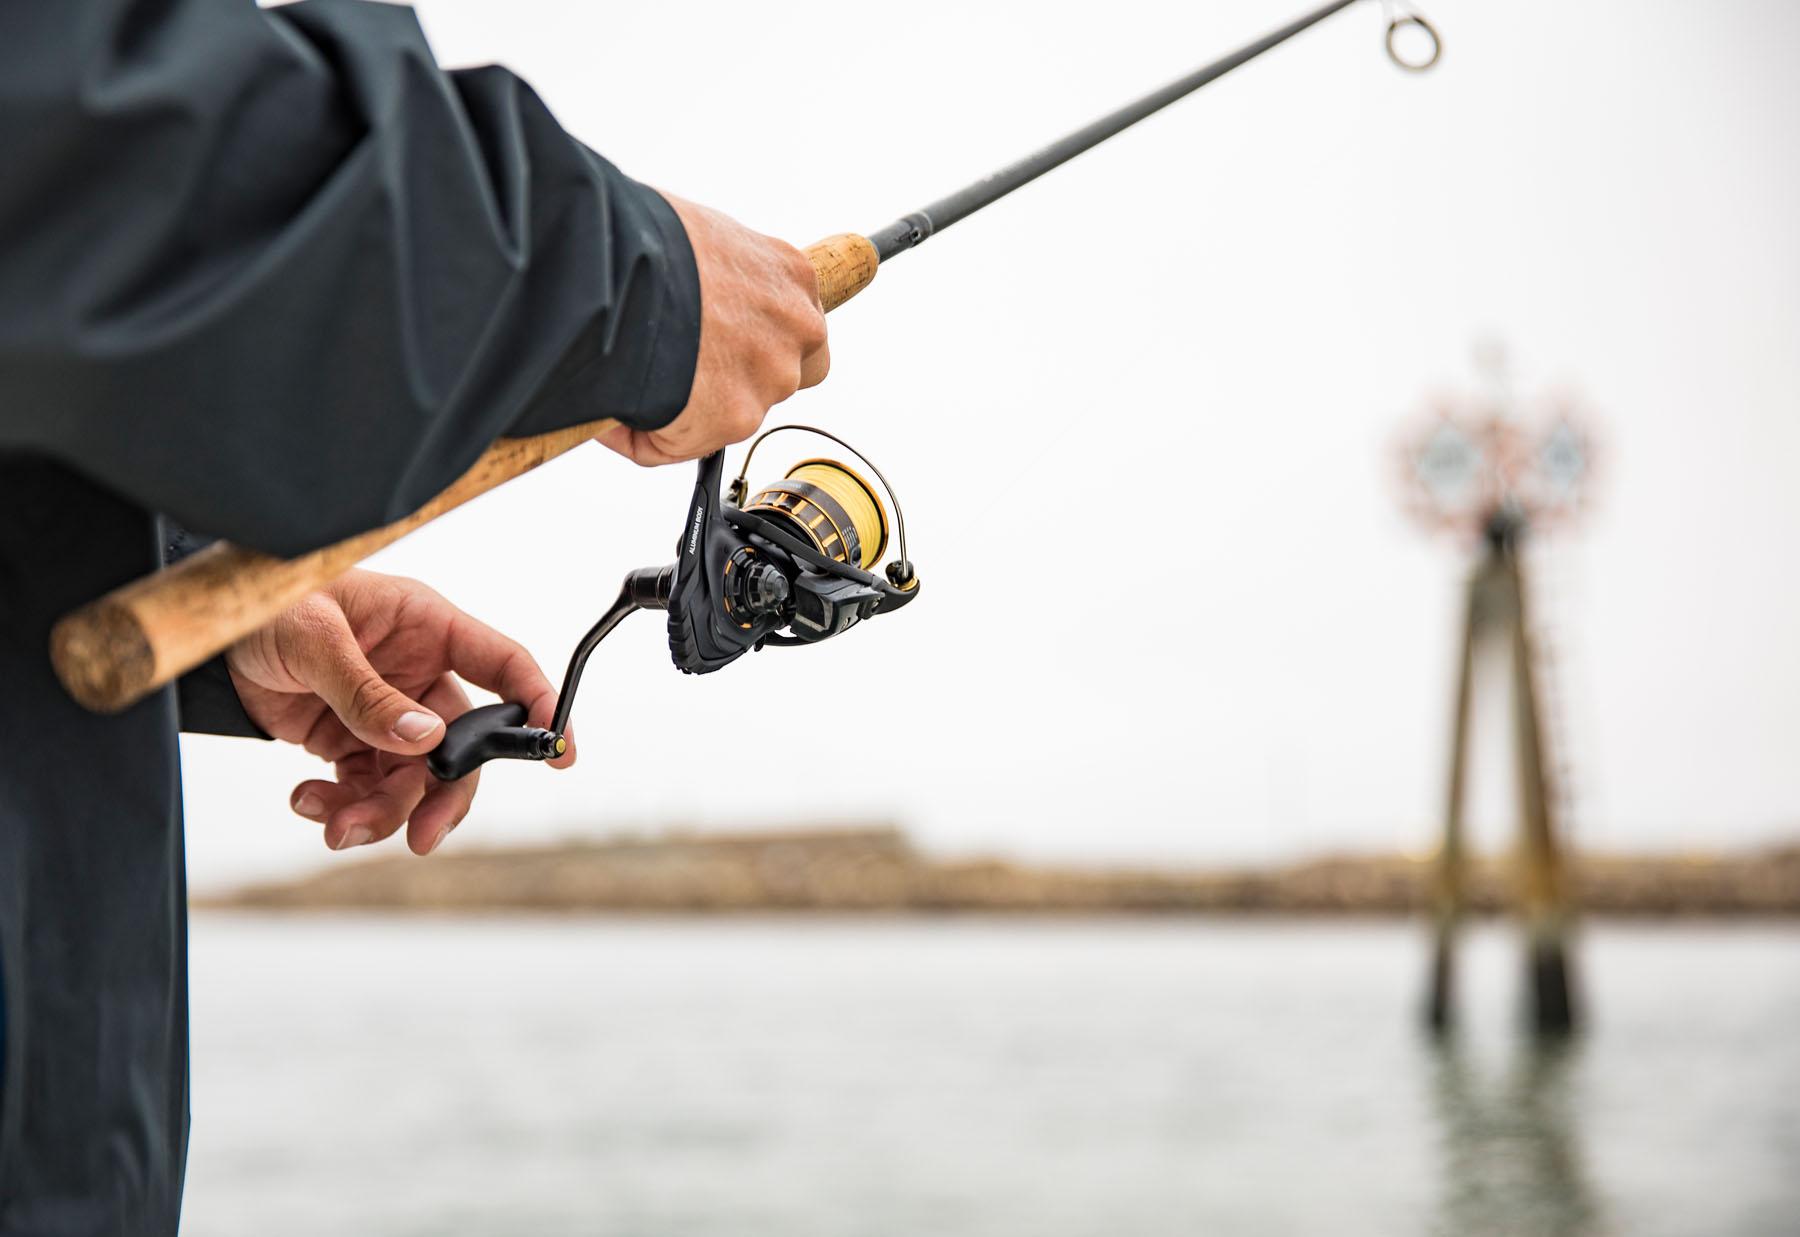 San diego bay fishing gallery risen tide sportfishing for Tides for fishing san diego